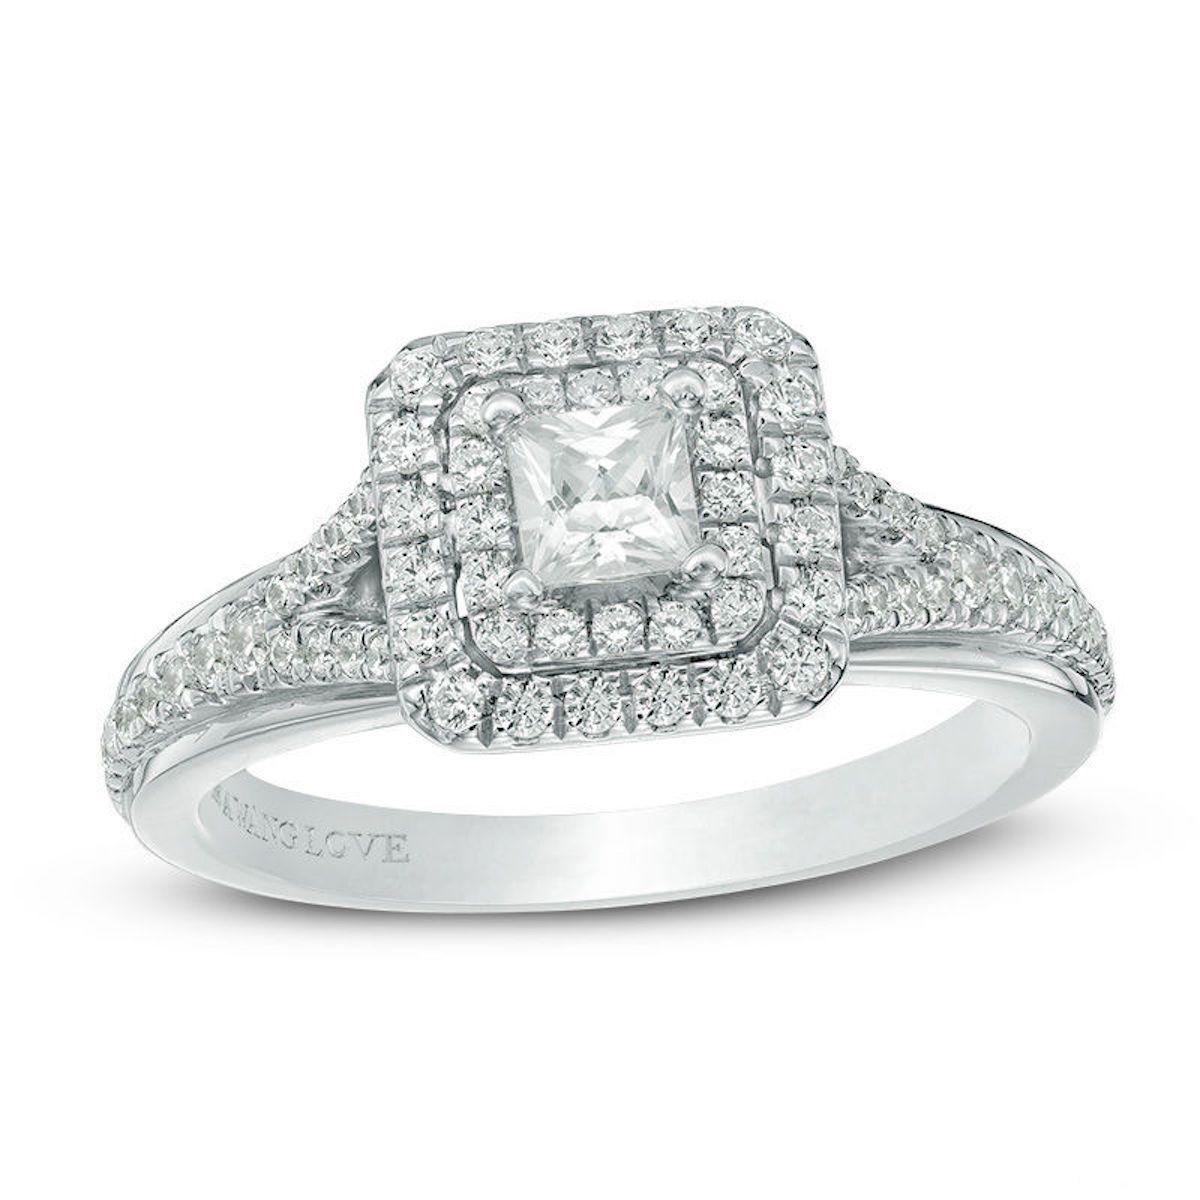 c59a3b277445d 87 Gorgeous Engagement Rings Under $2,000